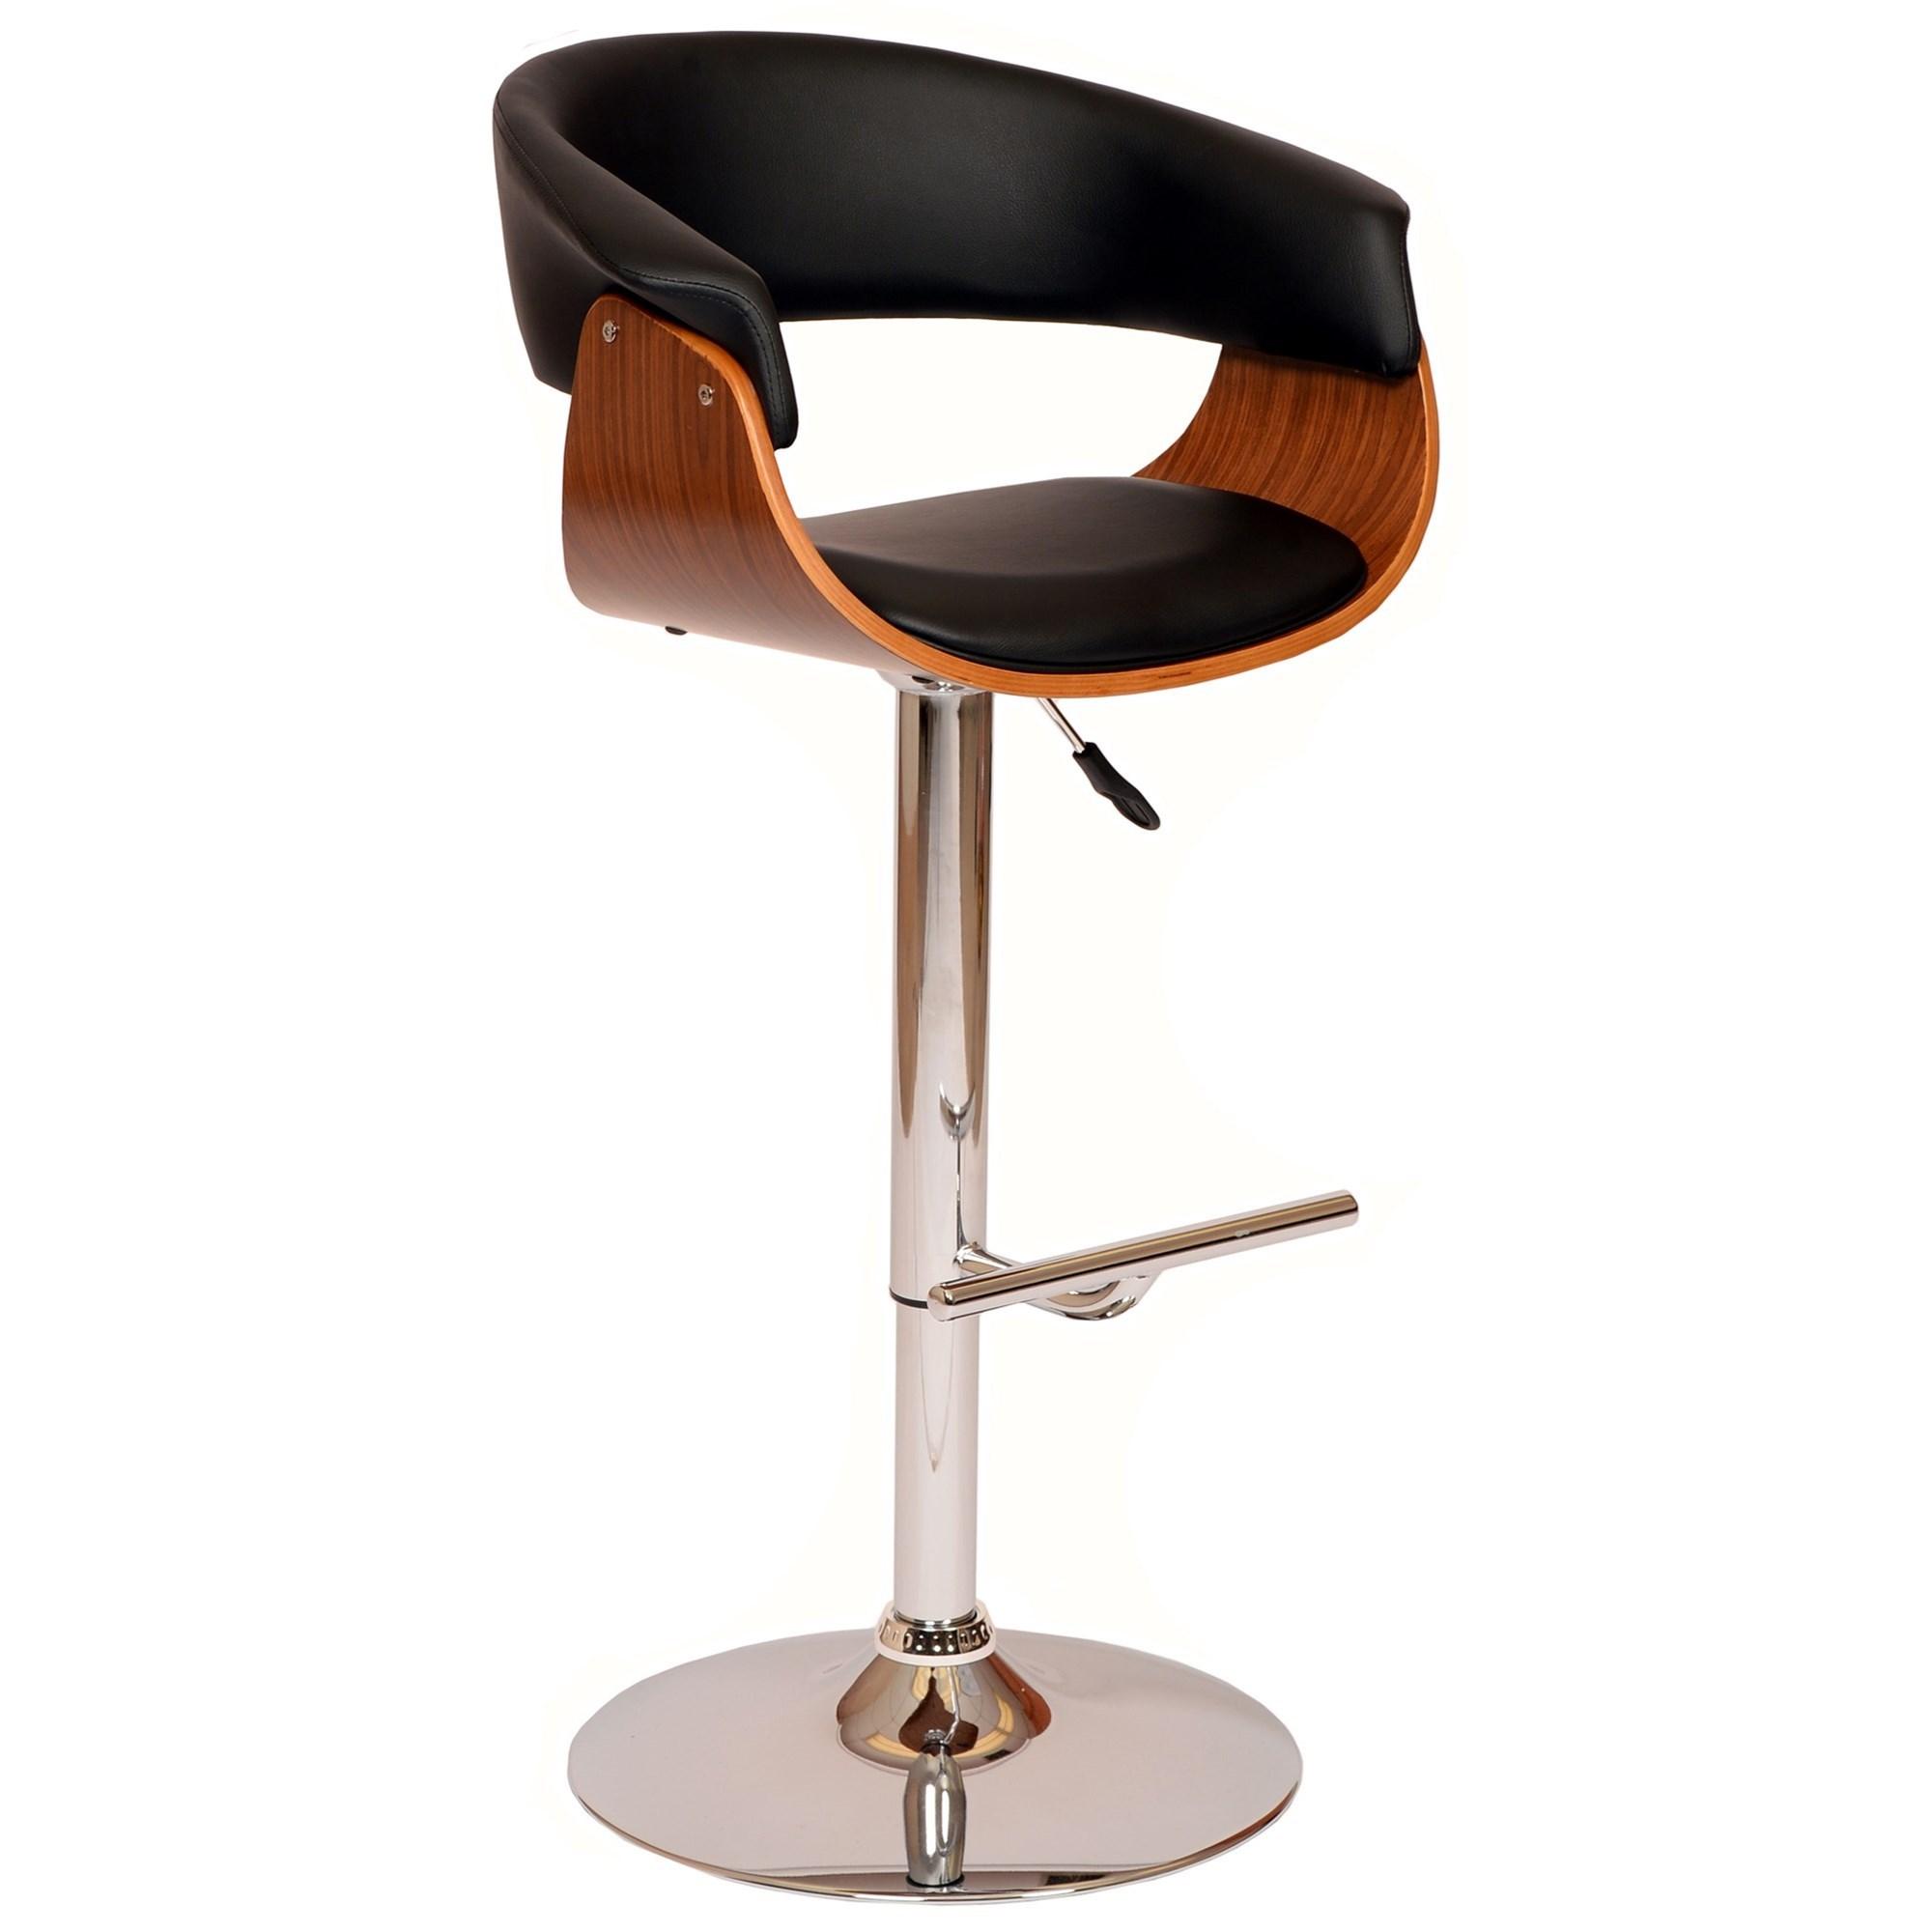 Paris Adjustable Swivel Bar Stool at Sadler's Home Furnishings